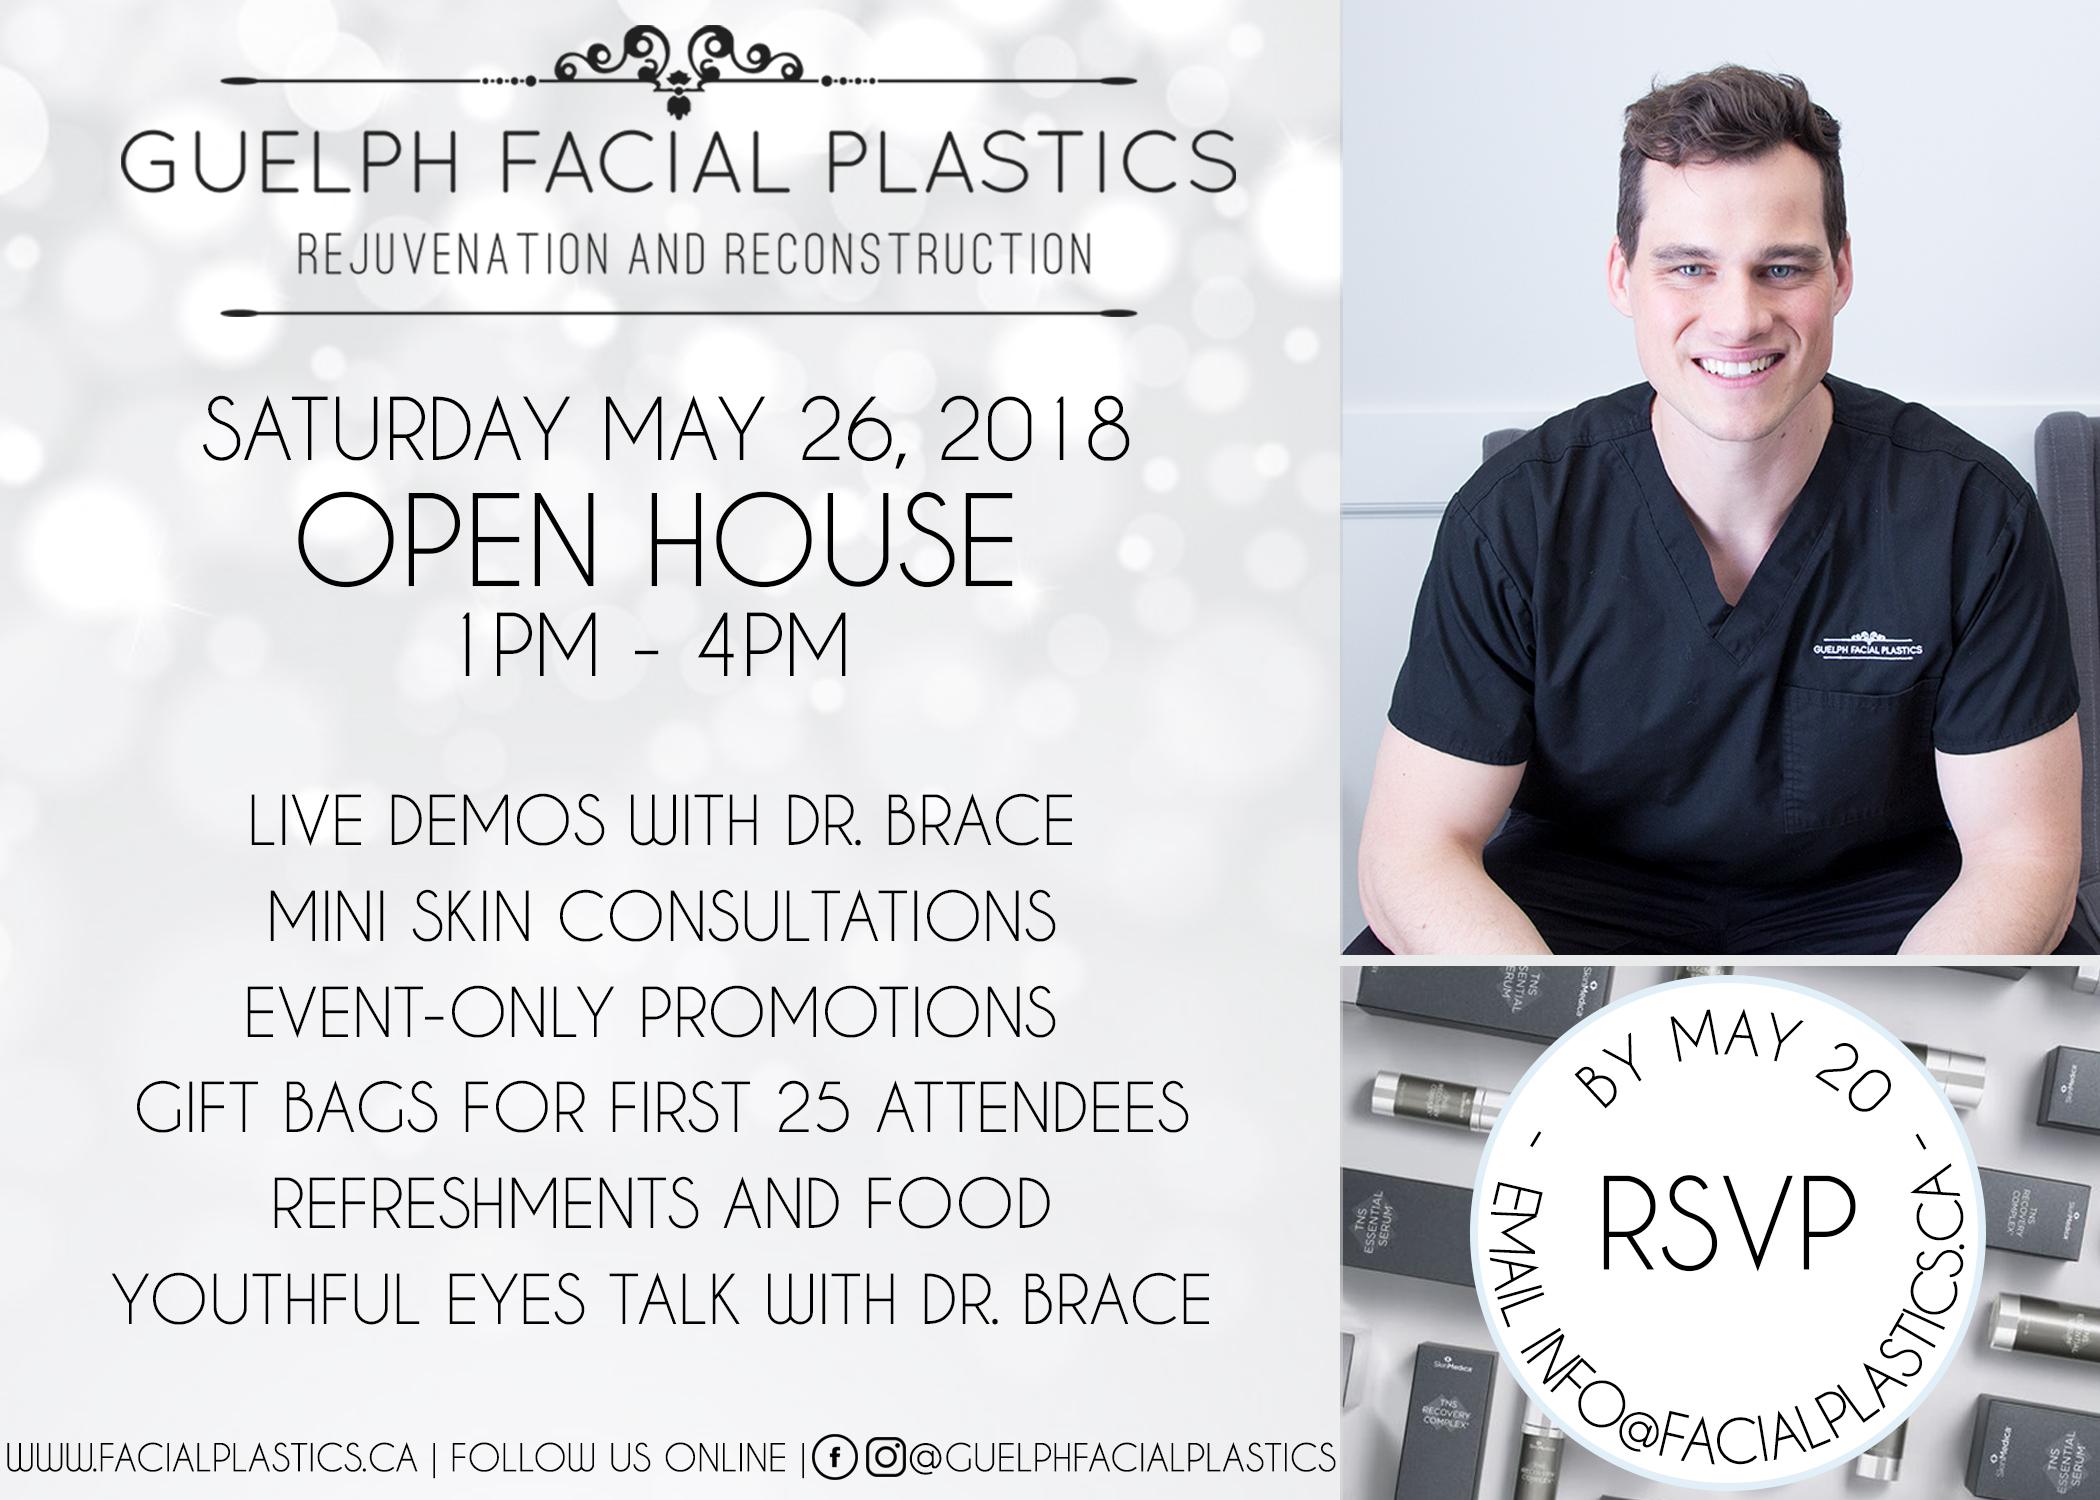 Guelph Facial Plastics Open House May 2018